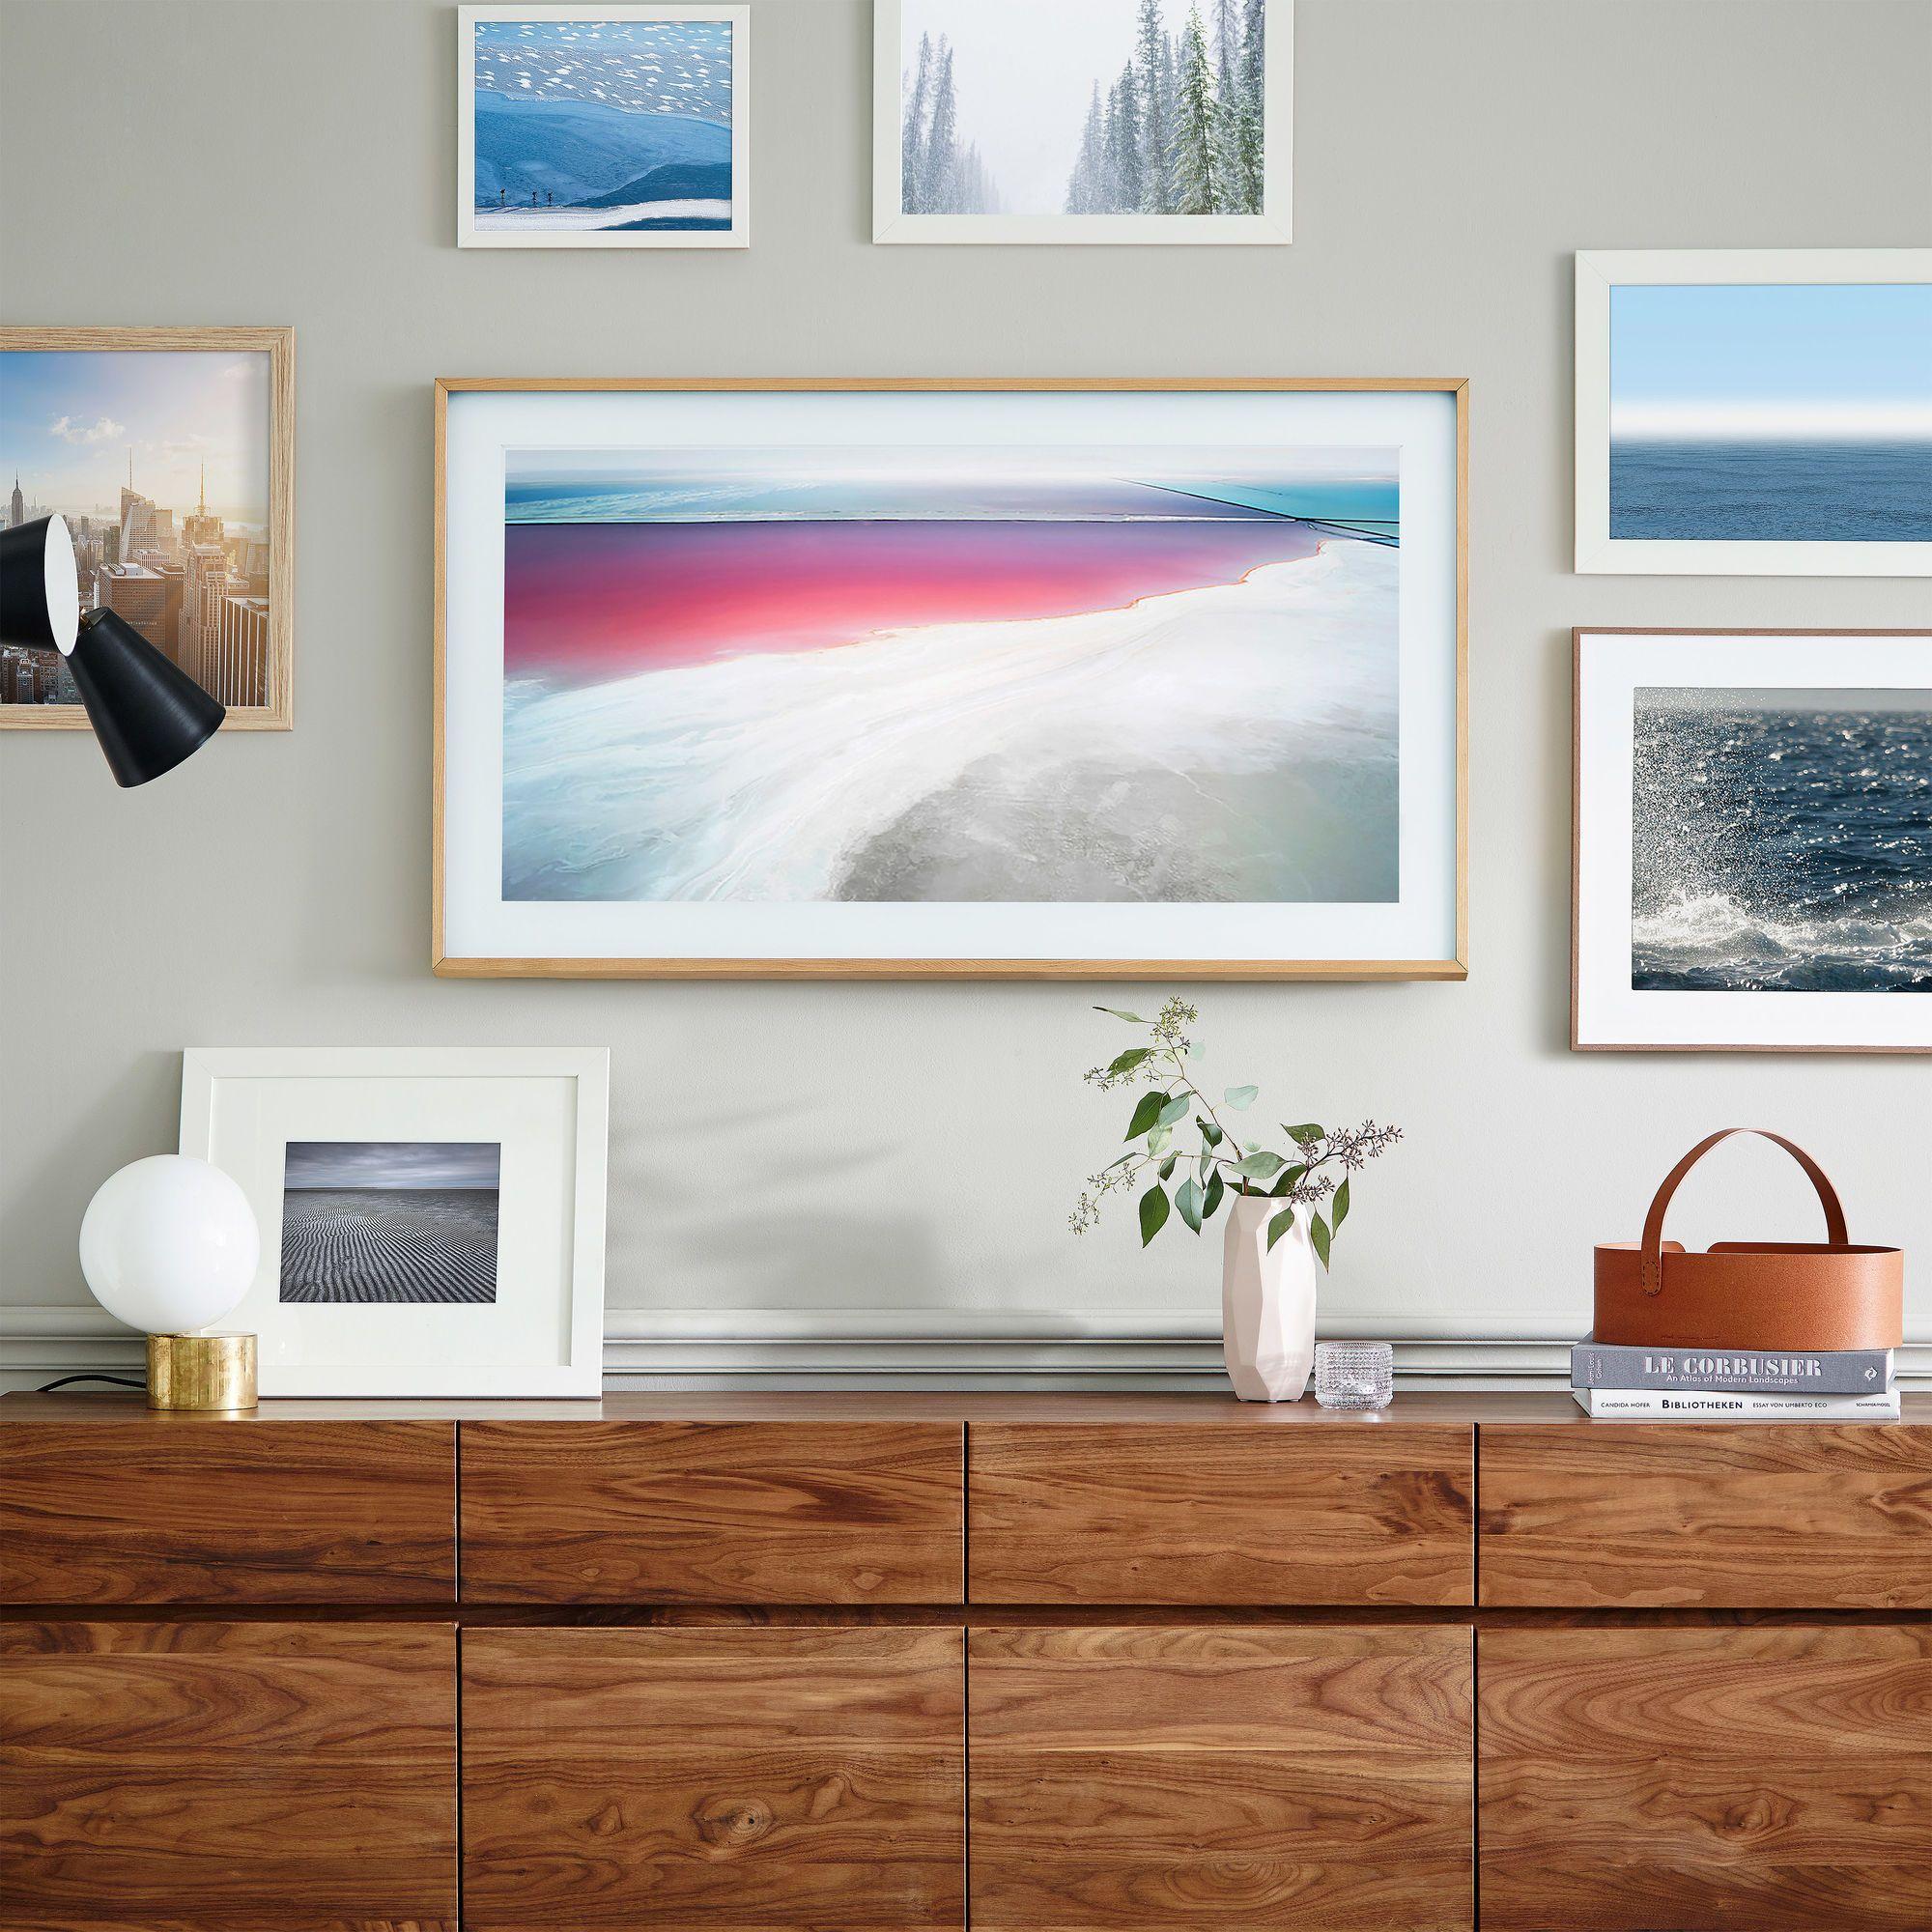 Samsung The Frame 4 0 Tv 2020 Framed Tv Picture Frame Tv Wall Mounted Tv